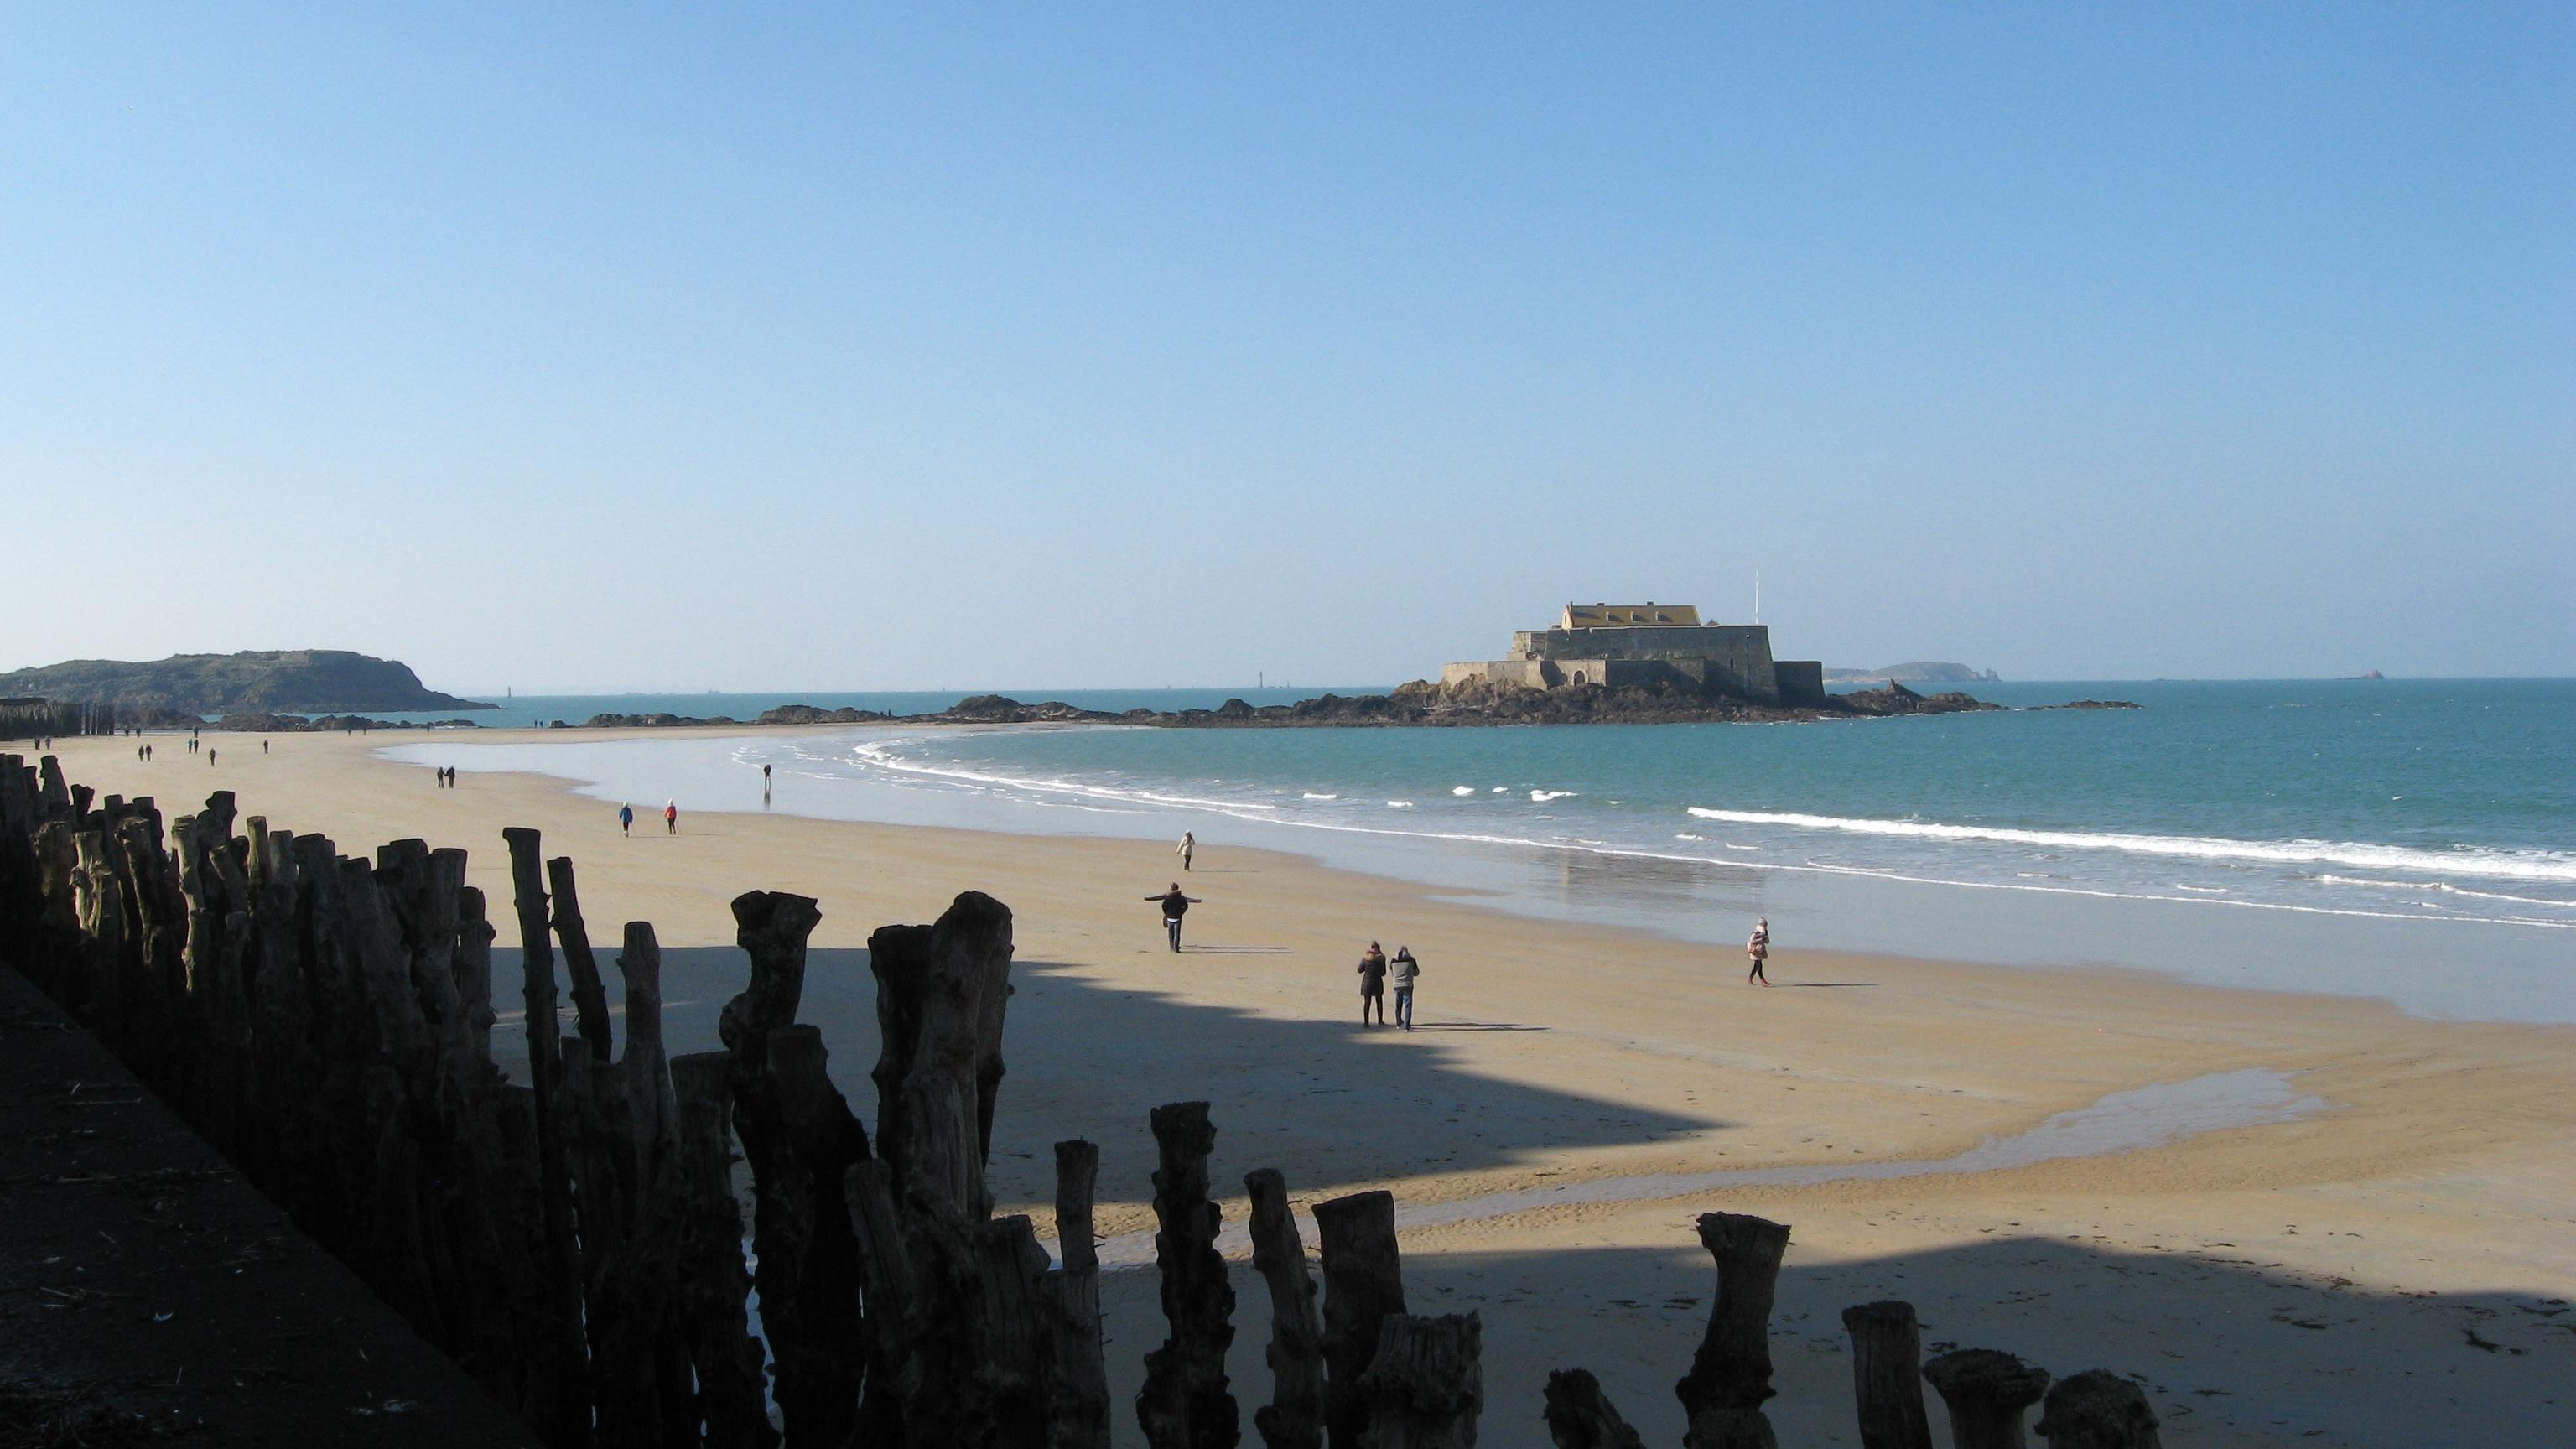 grande-plage-fort-saint-malo-ille-et-vilaine-bretagne